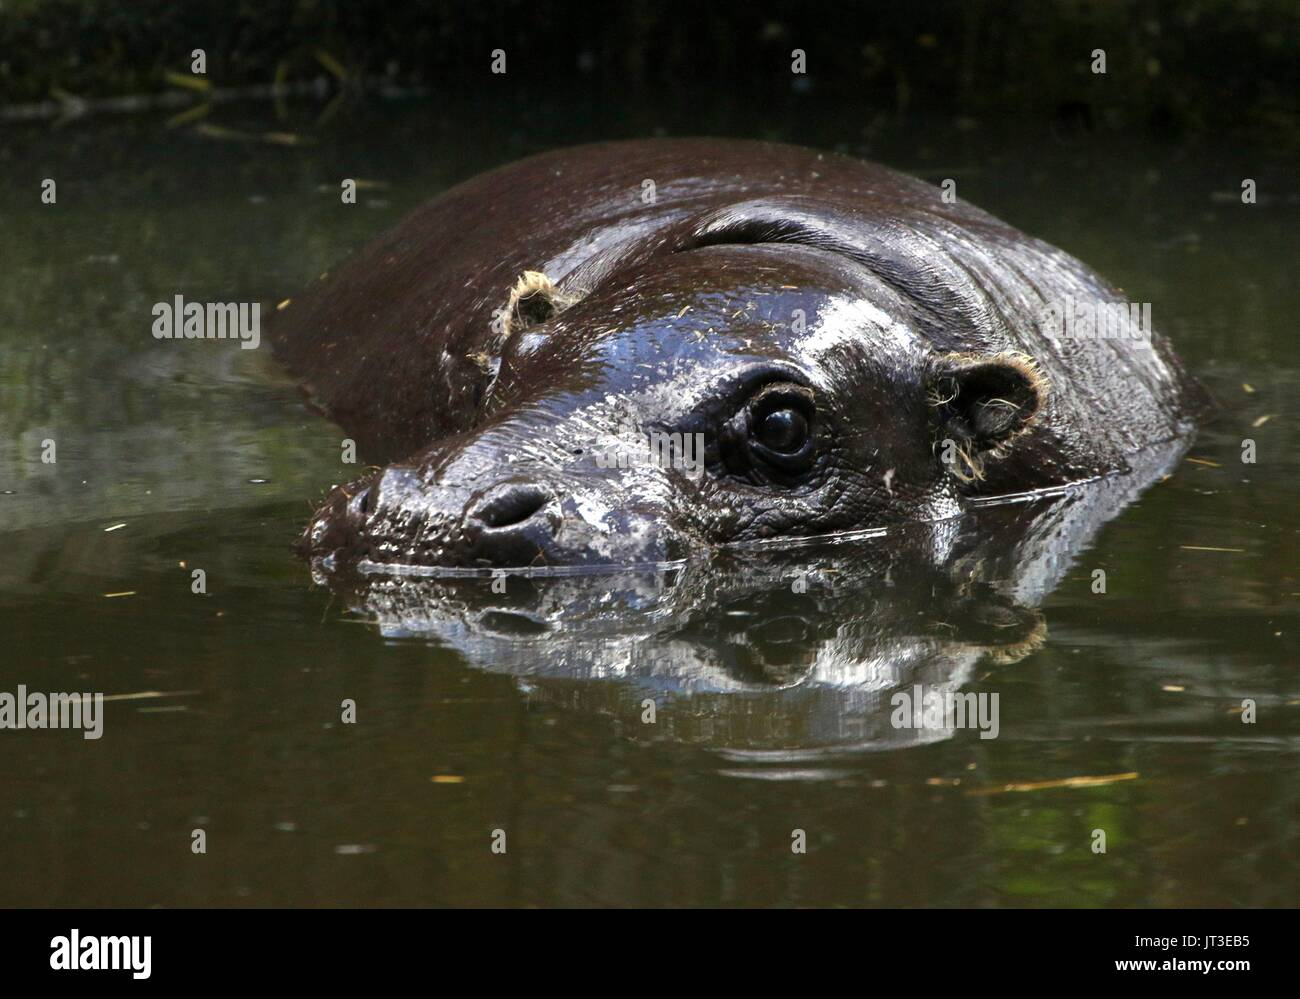 West African Pygmy hippopotamus (Hexaprotodon liberiensis, Choeropsis liberiensis) - Stock Image